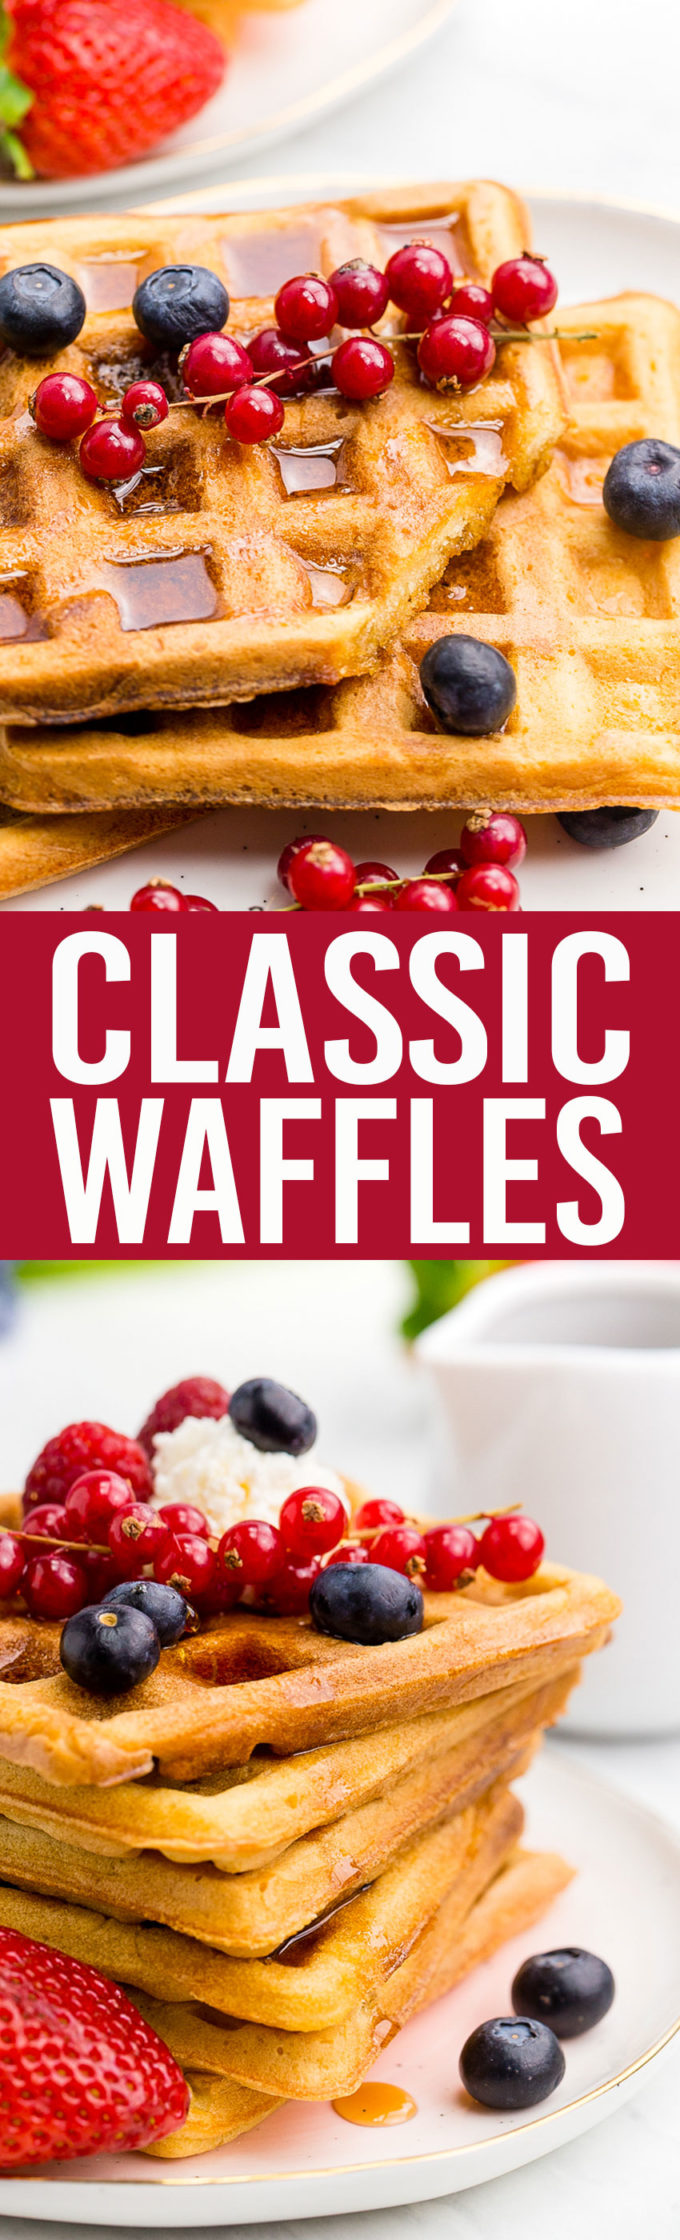 This Classic Waffles recipe is amazing, crispy exterior, tender fluffy interior. Yum.